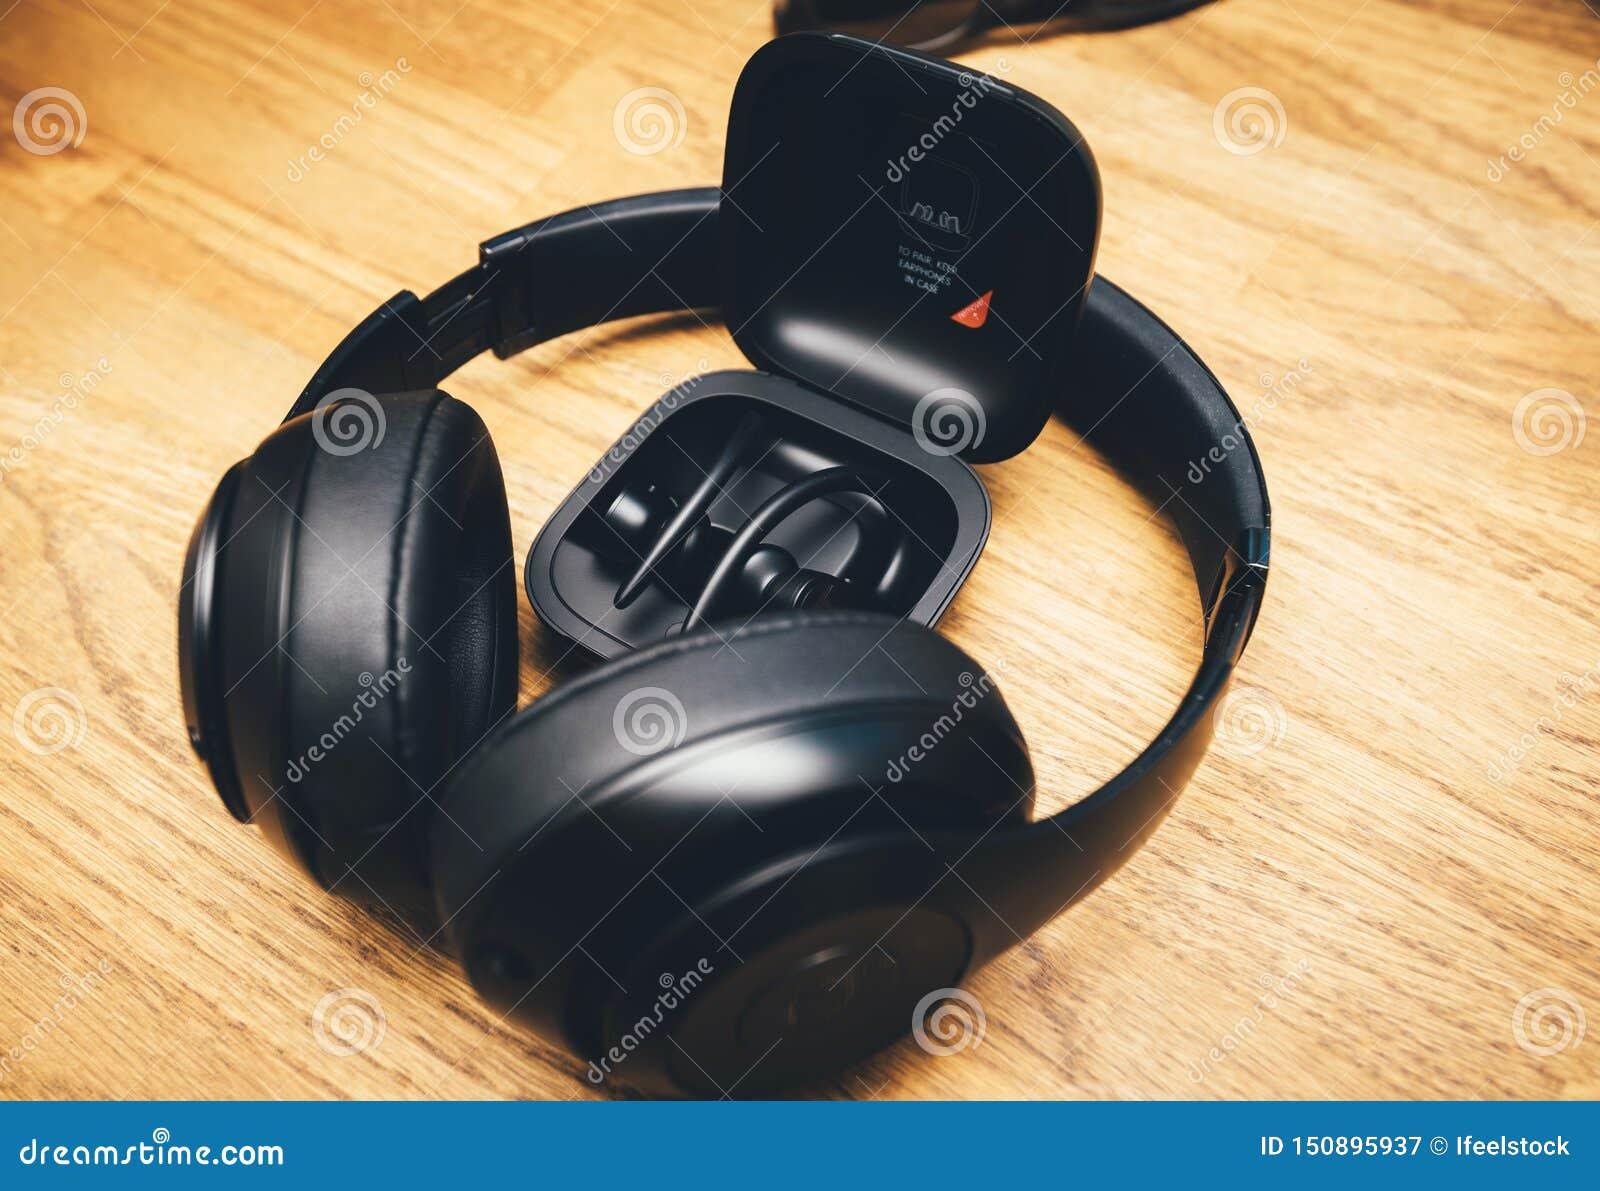 Beats Studio 3 Wireless And Powerbeats Pro Beats On Table Desk Editorial Photography Image Of Listening Headphones 150895937